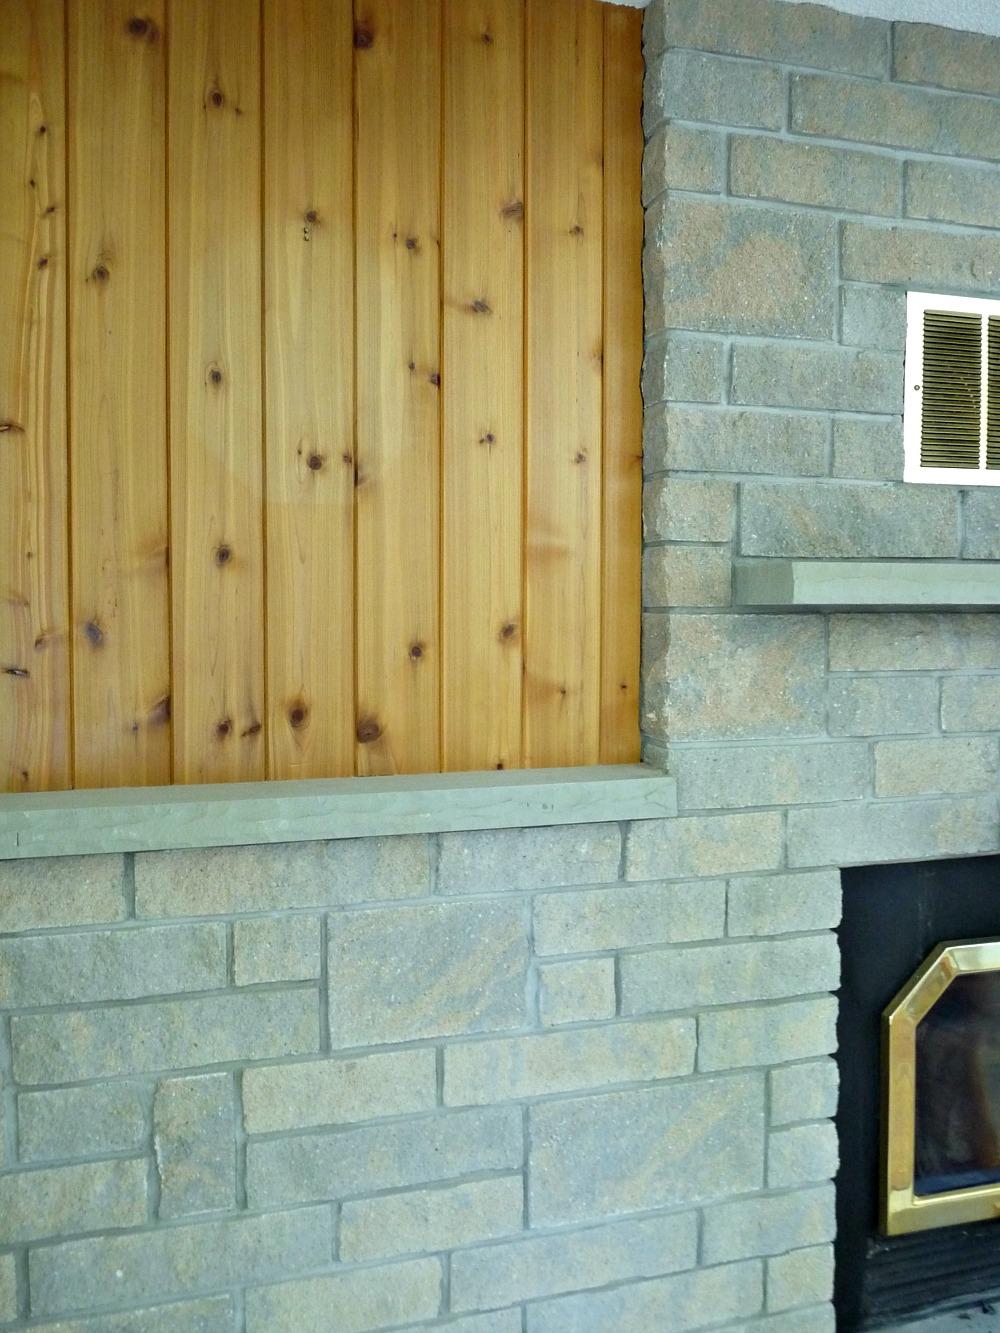 Planning to Paint a Brick Fireplace - Inspiration   Dans le Lakehouse